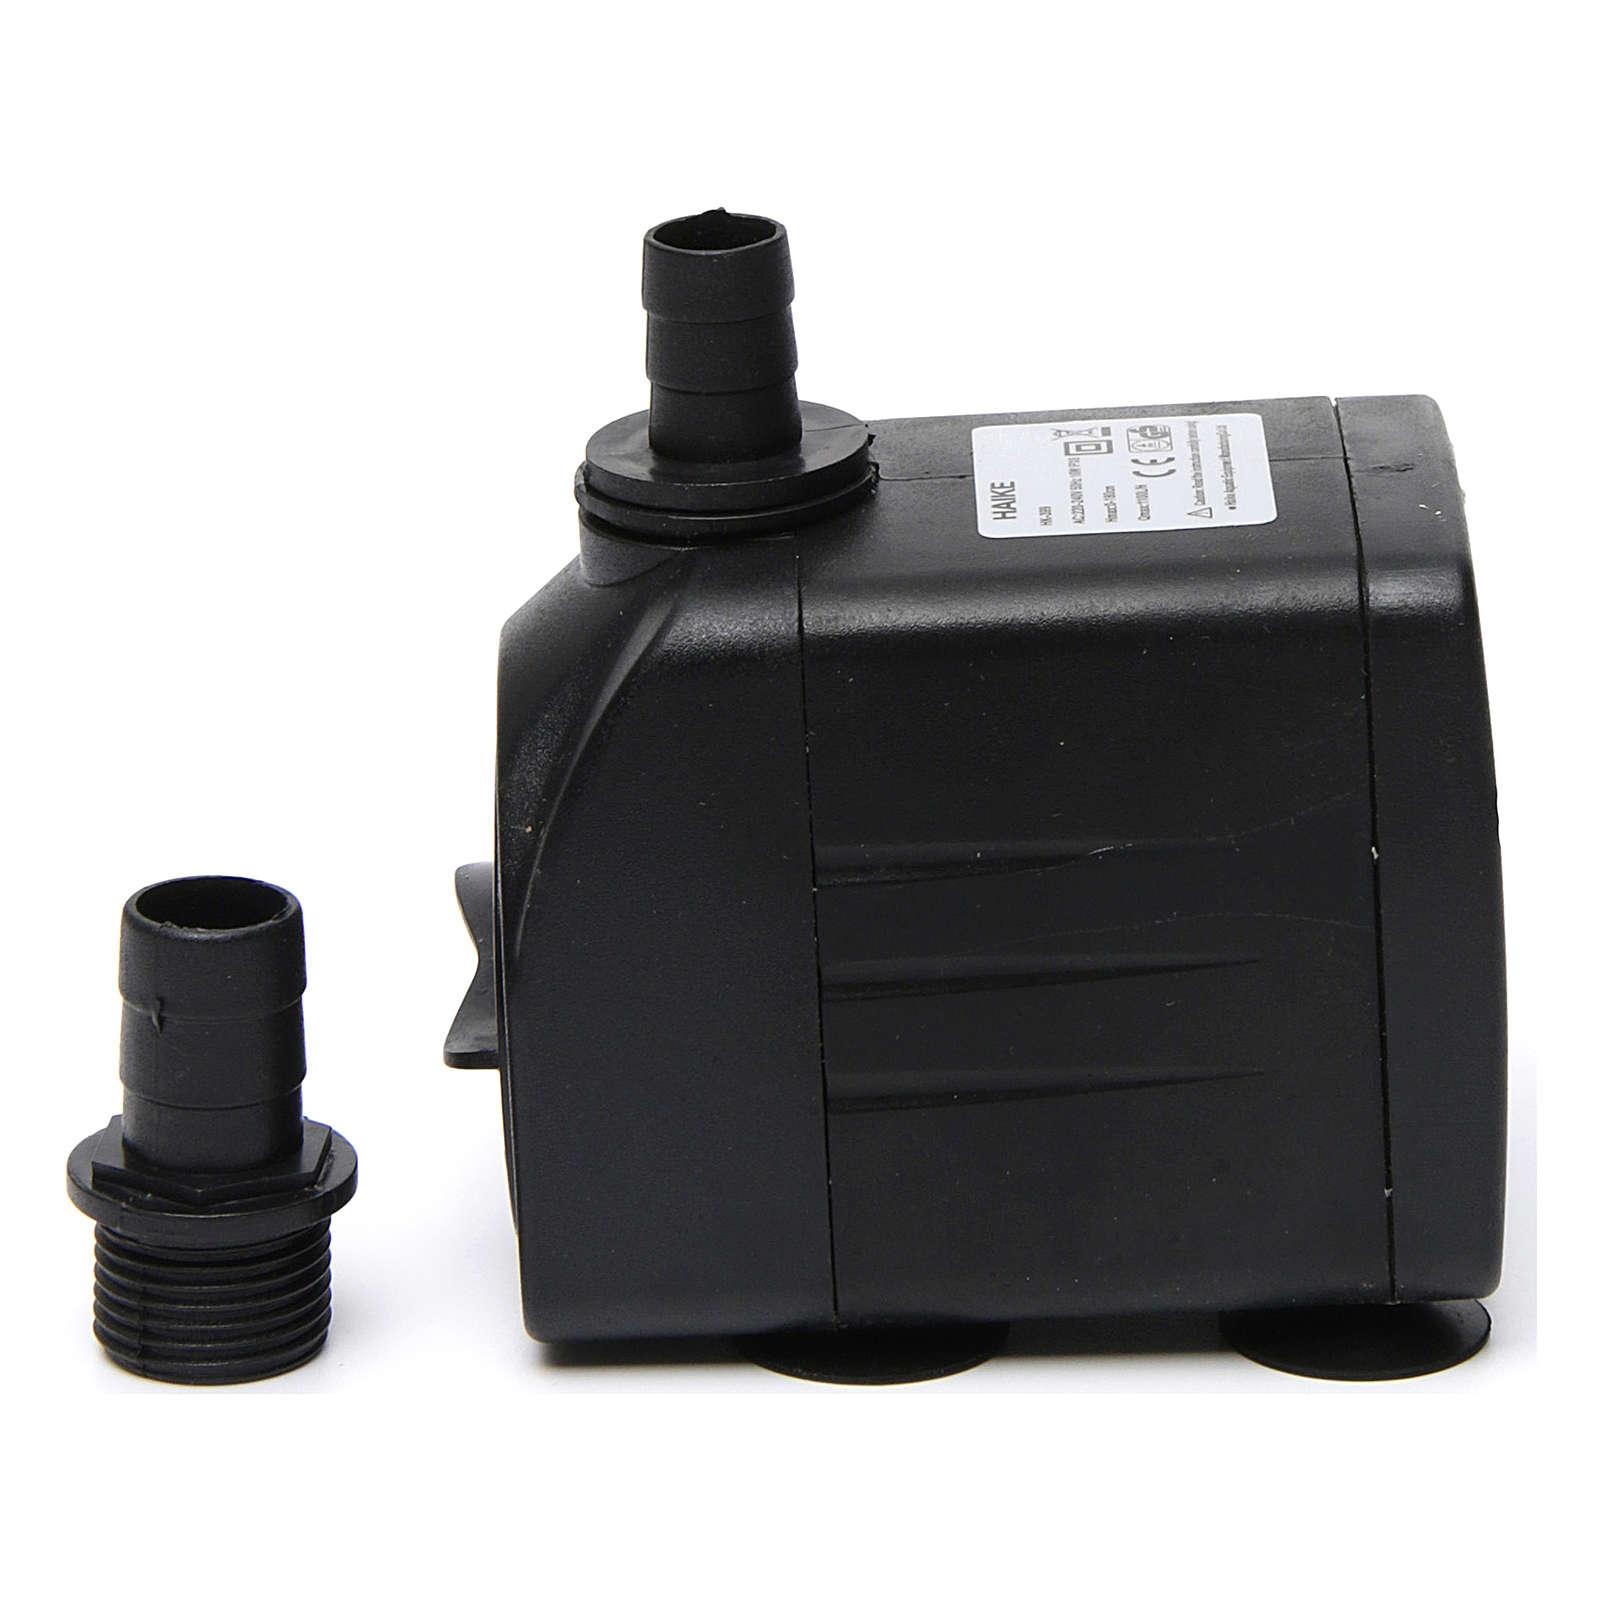 Pompa per fontana presepe 16w AP399A 4